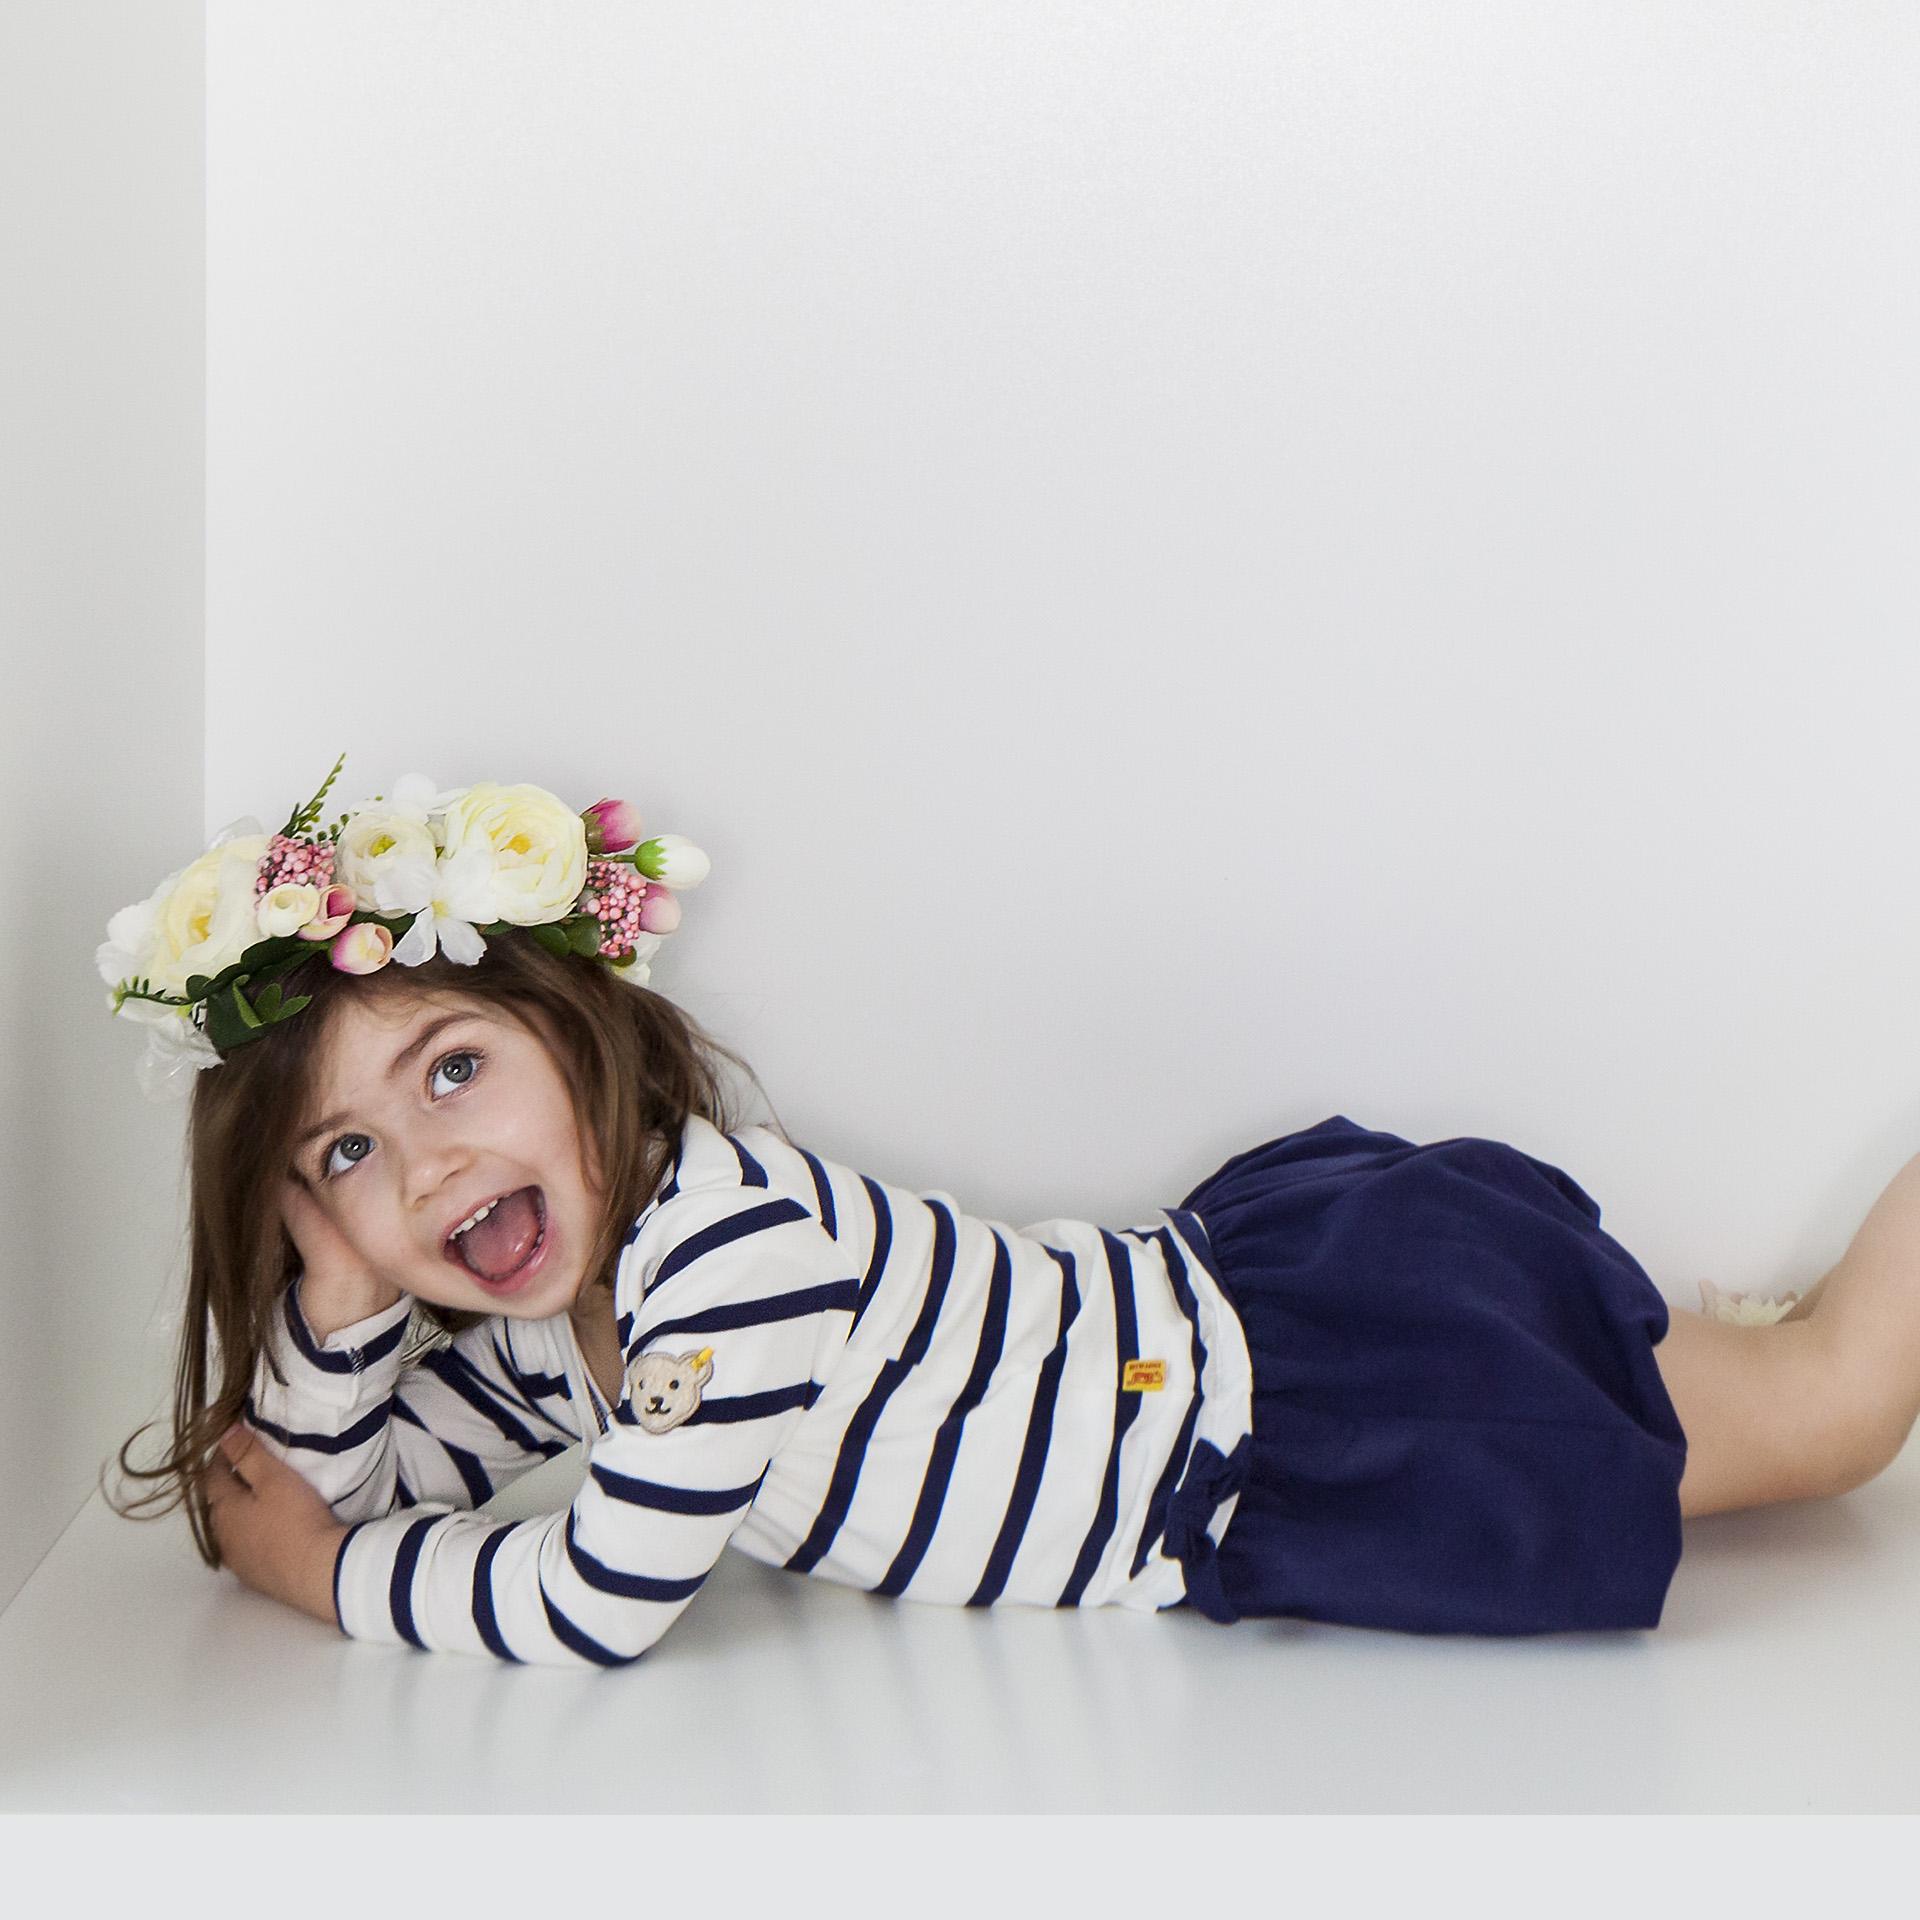 galerie-littleboxes-04-kindergartenfotografie